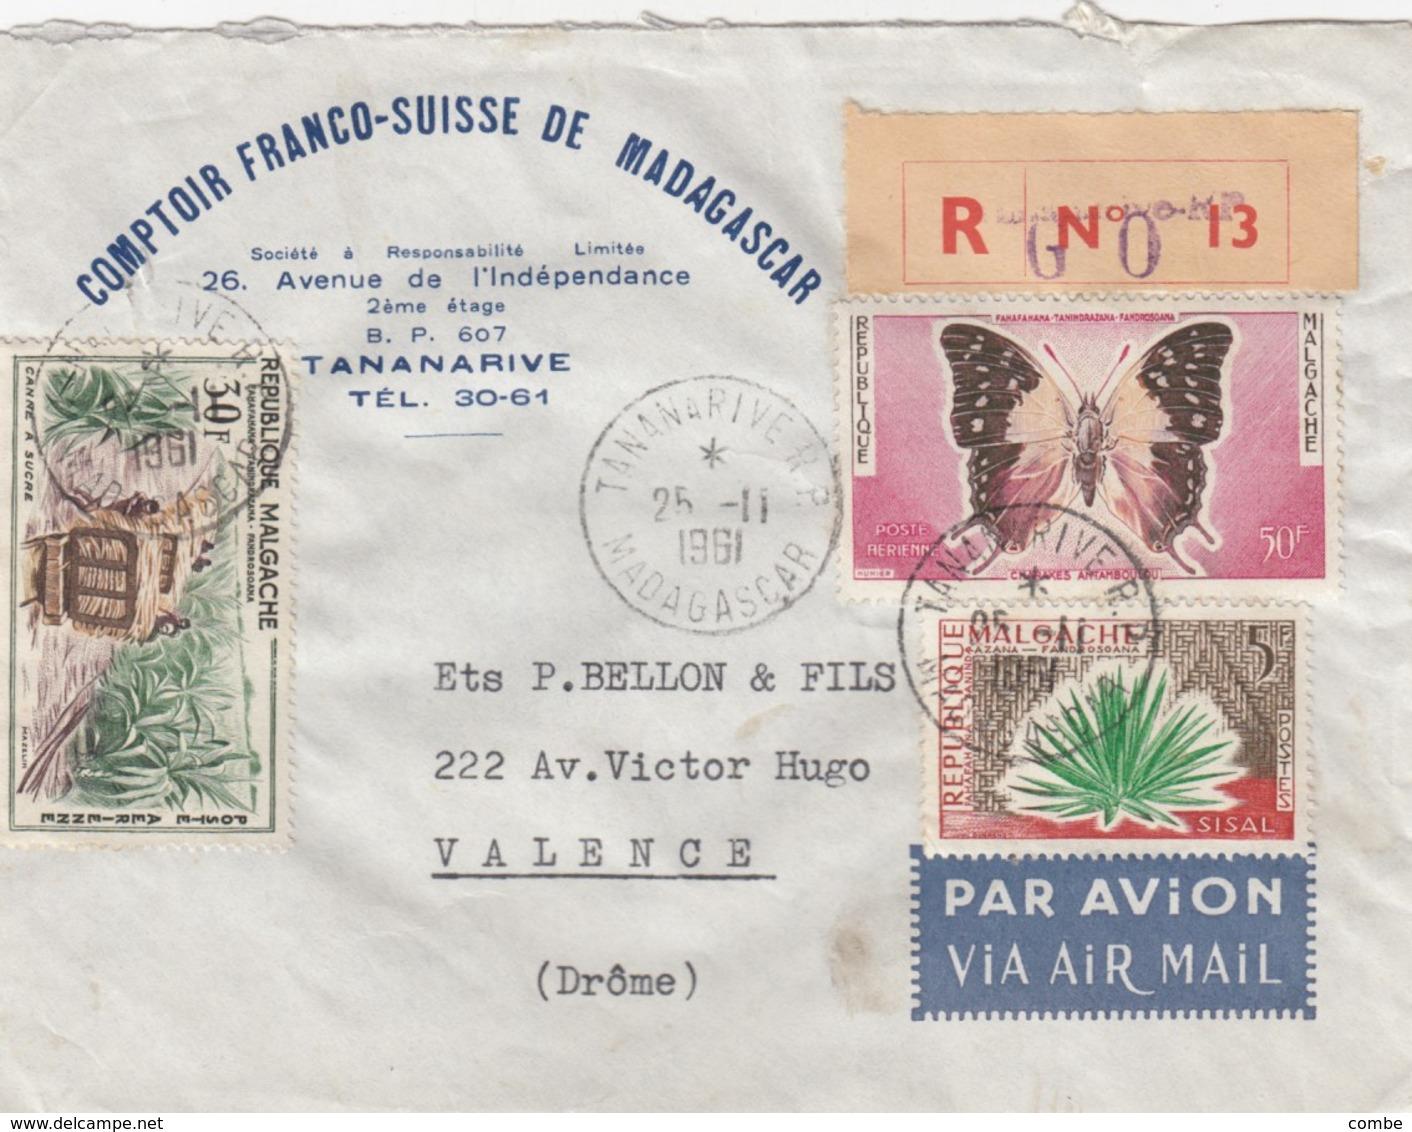 LETTRE. COVER.  1961. RECOMMANDÉ COMPTOIR FRANCO-SUISSE DE MADAGASCAR TANANARIVE  TO FRANCE - Ohne Zuordnung